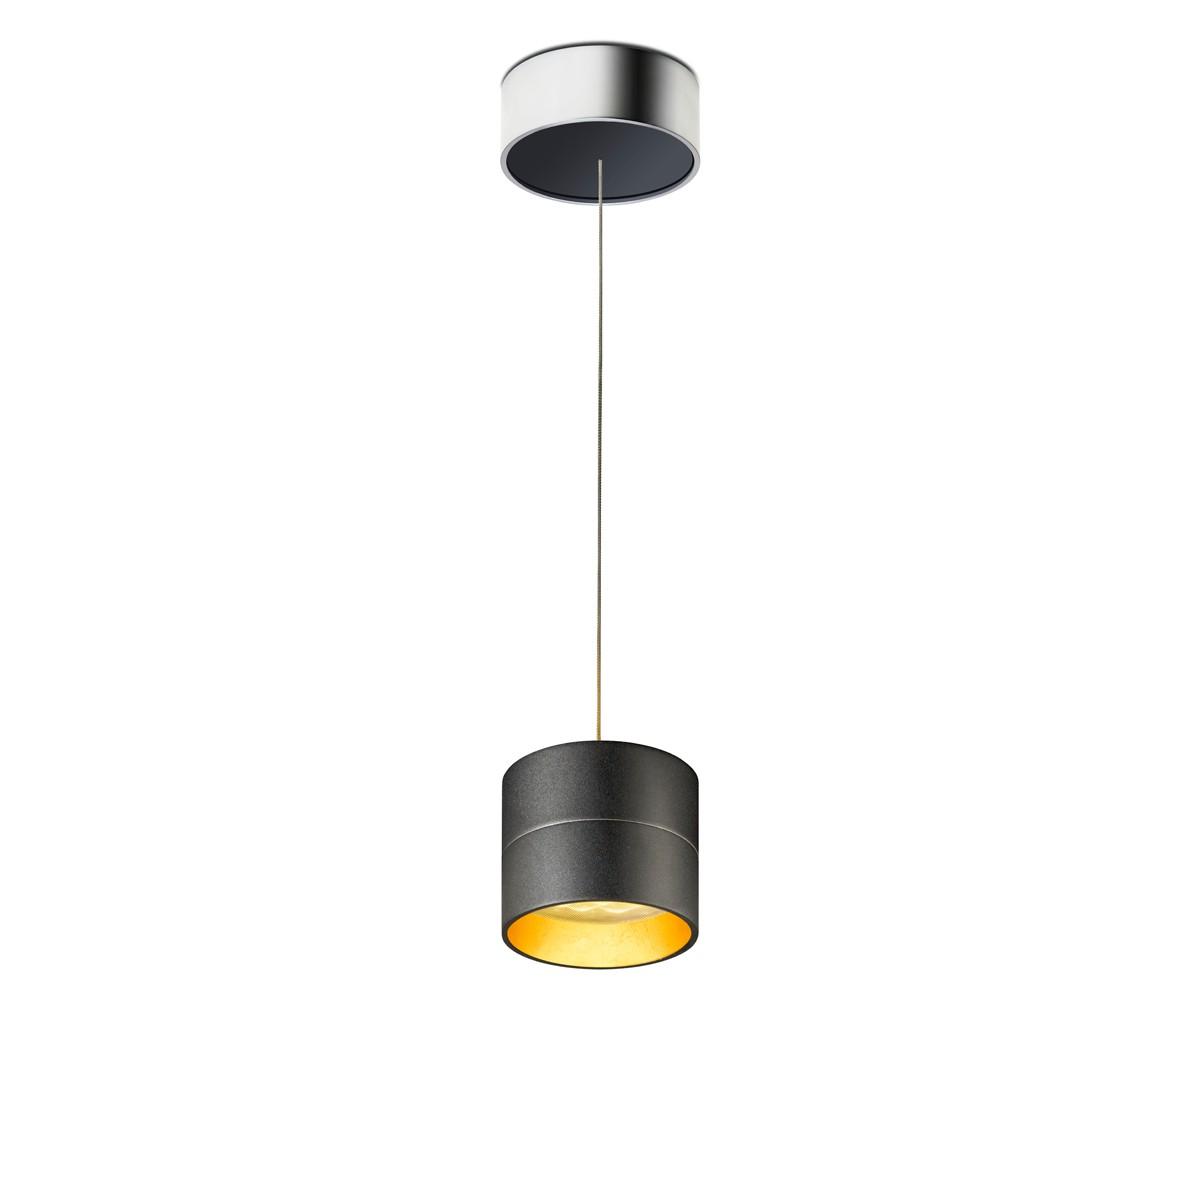 oligo tudor s pendelleuchte schwarz matt blattgold mobil saege werk bickenbach. Black Bedroom Furniture Sets. Home Design Ideas